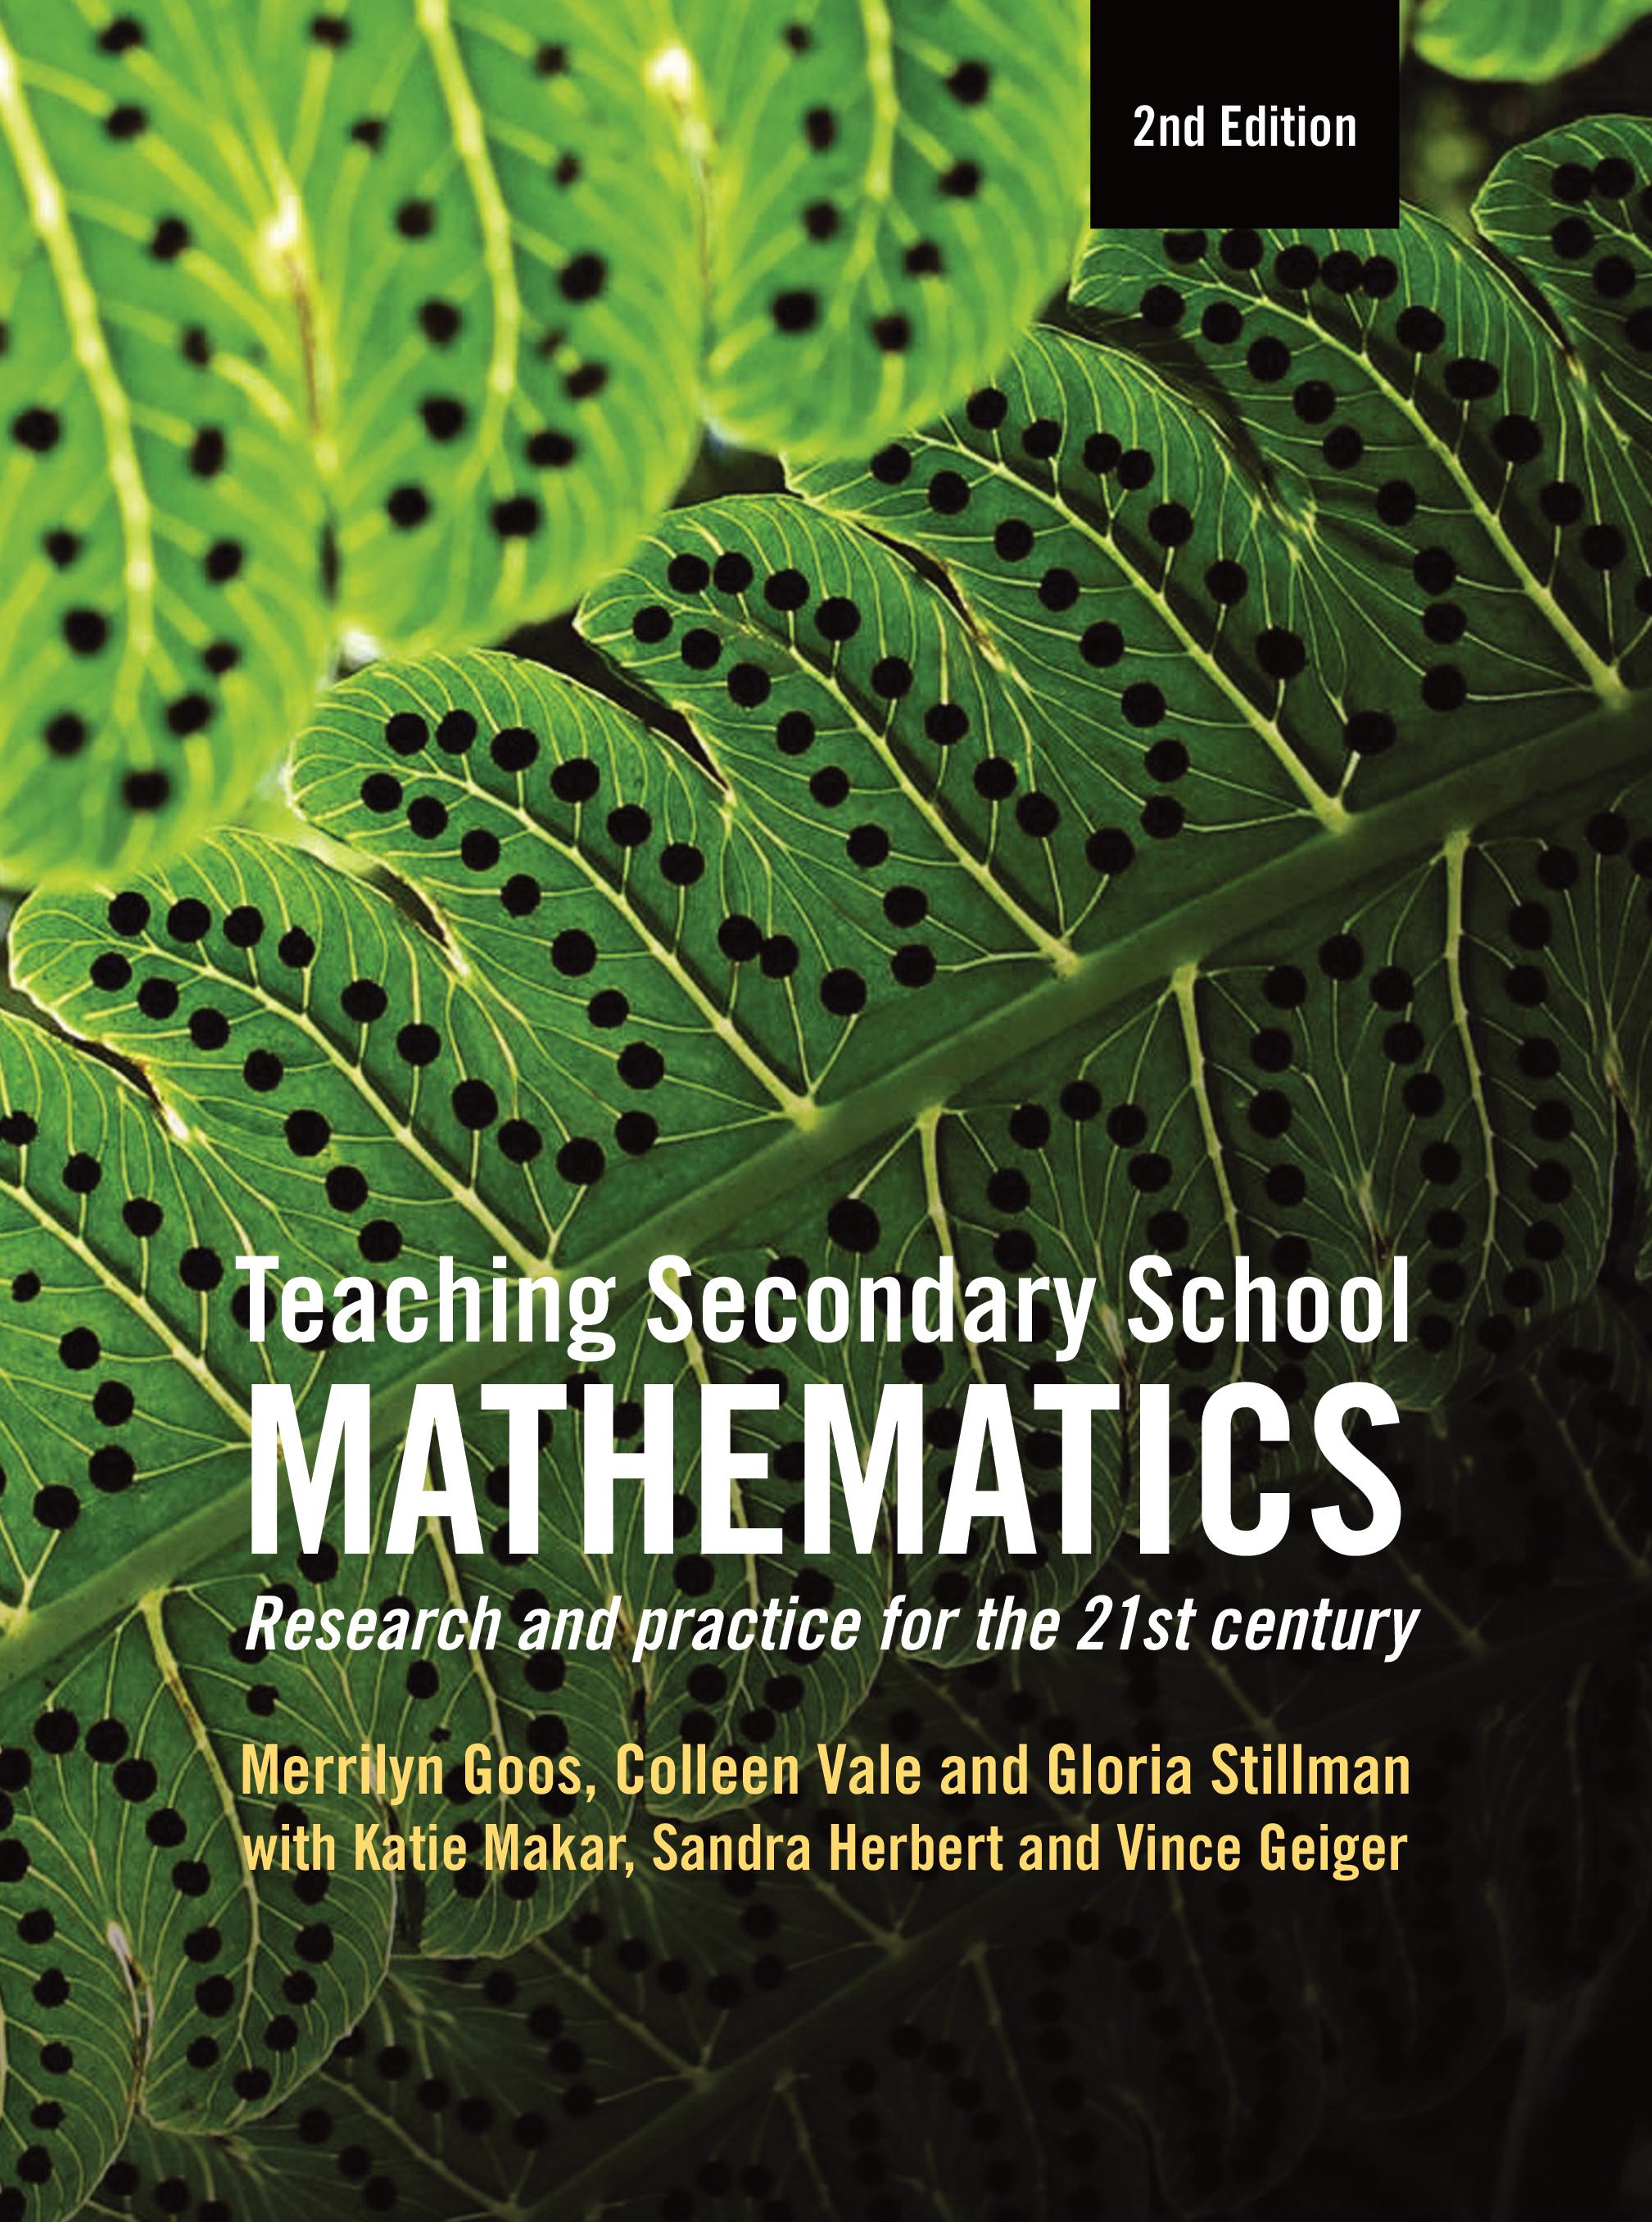 Teaching Secondary School Mathematics - Merrilyn Goos